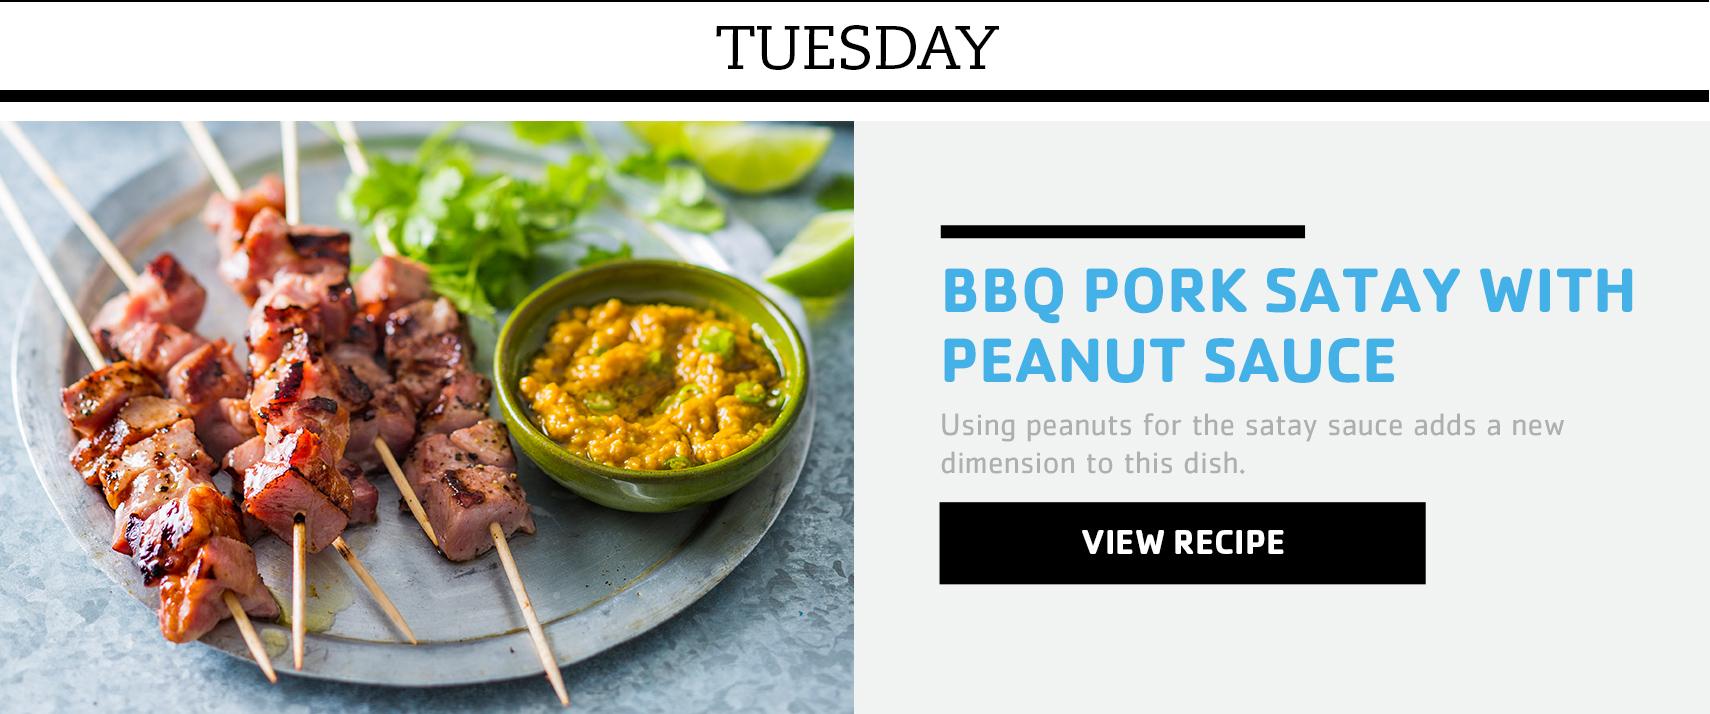 02-bbq-pork-satay-with-peanut-sauce.jpg